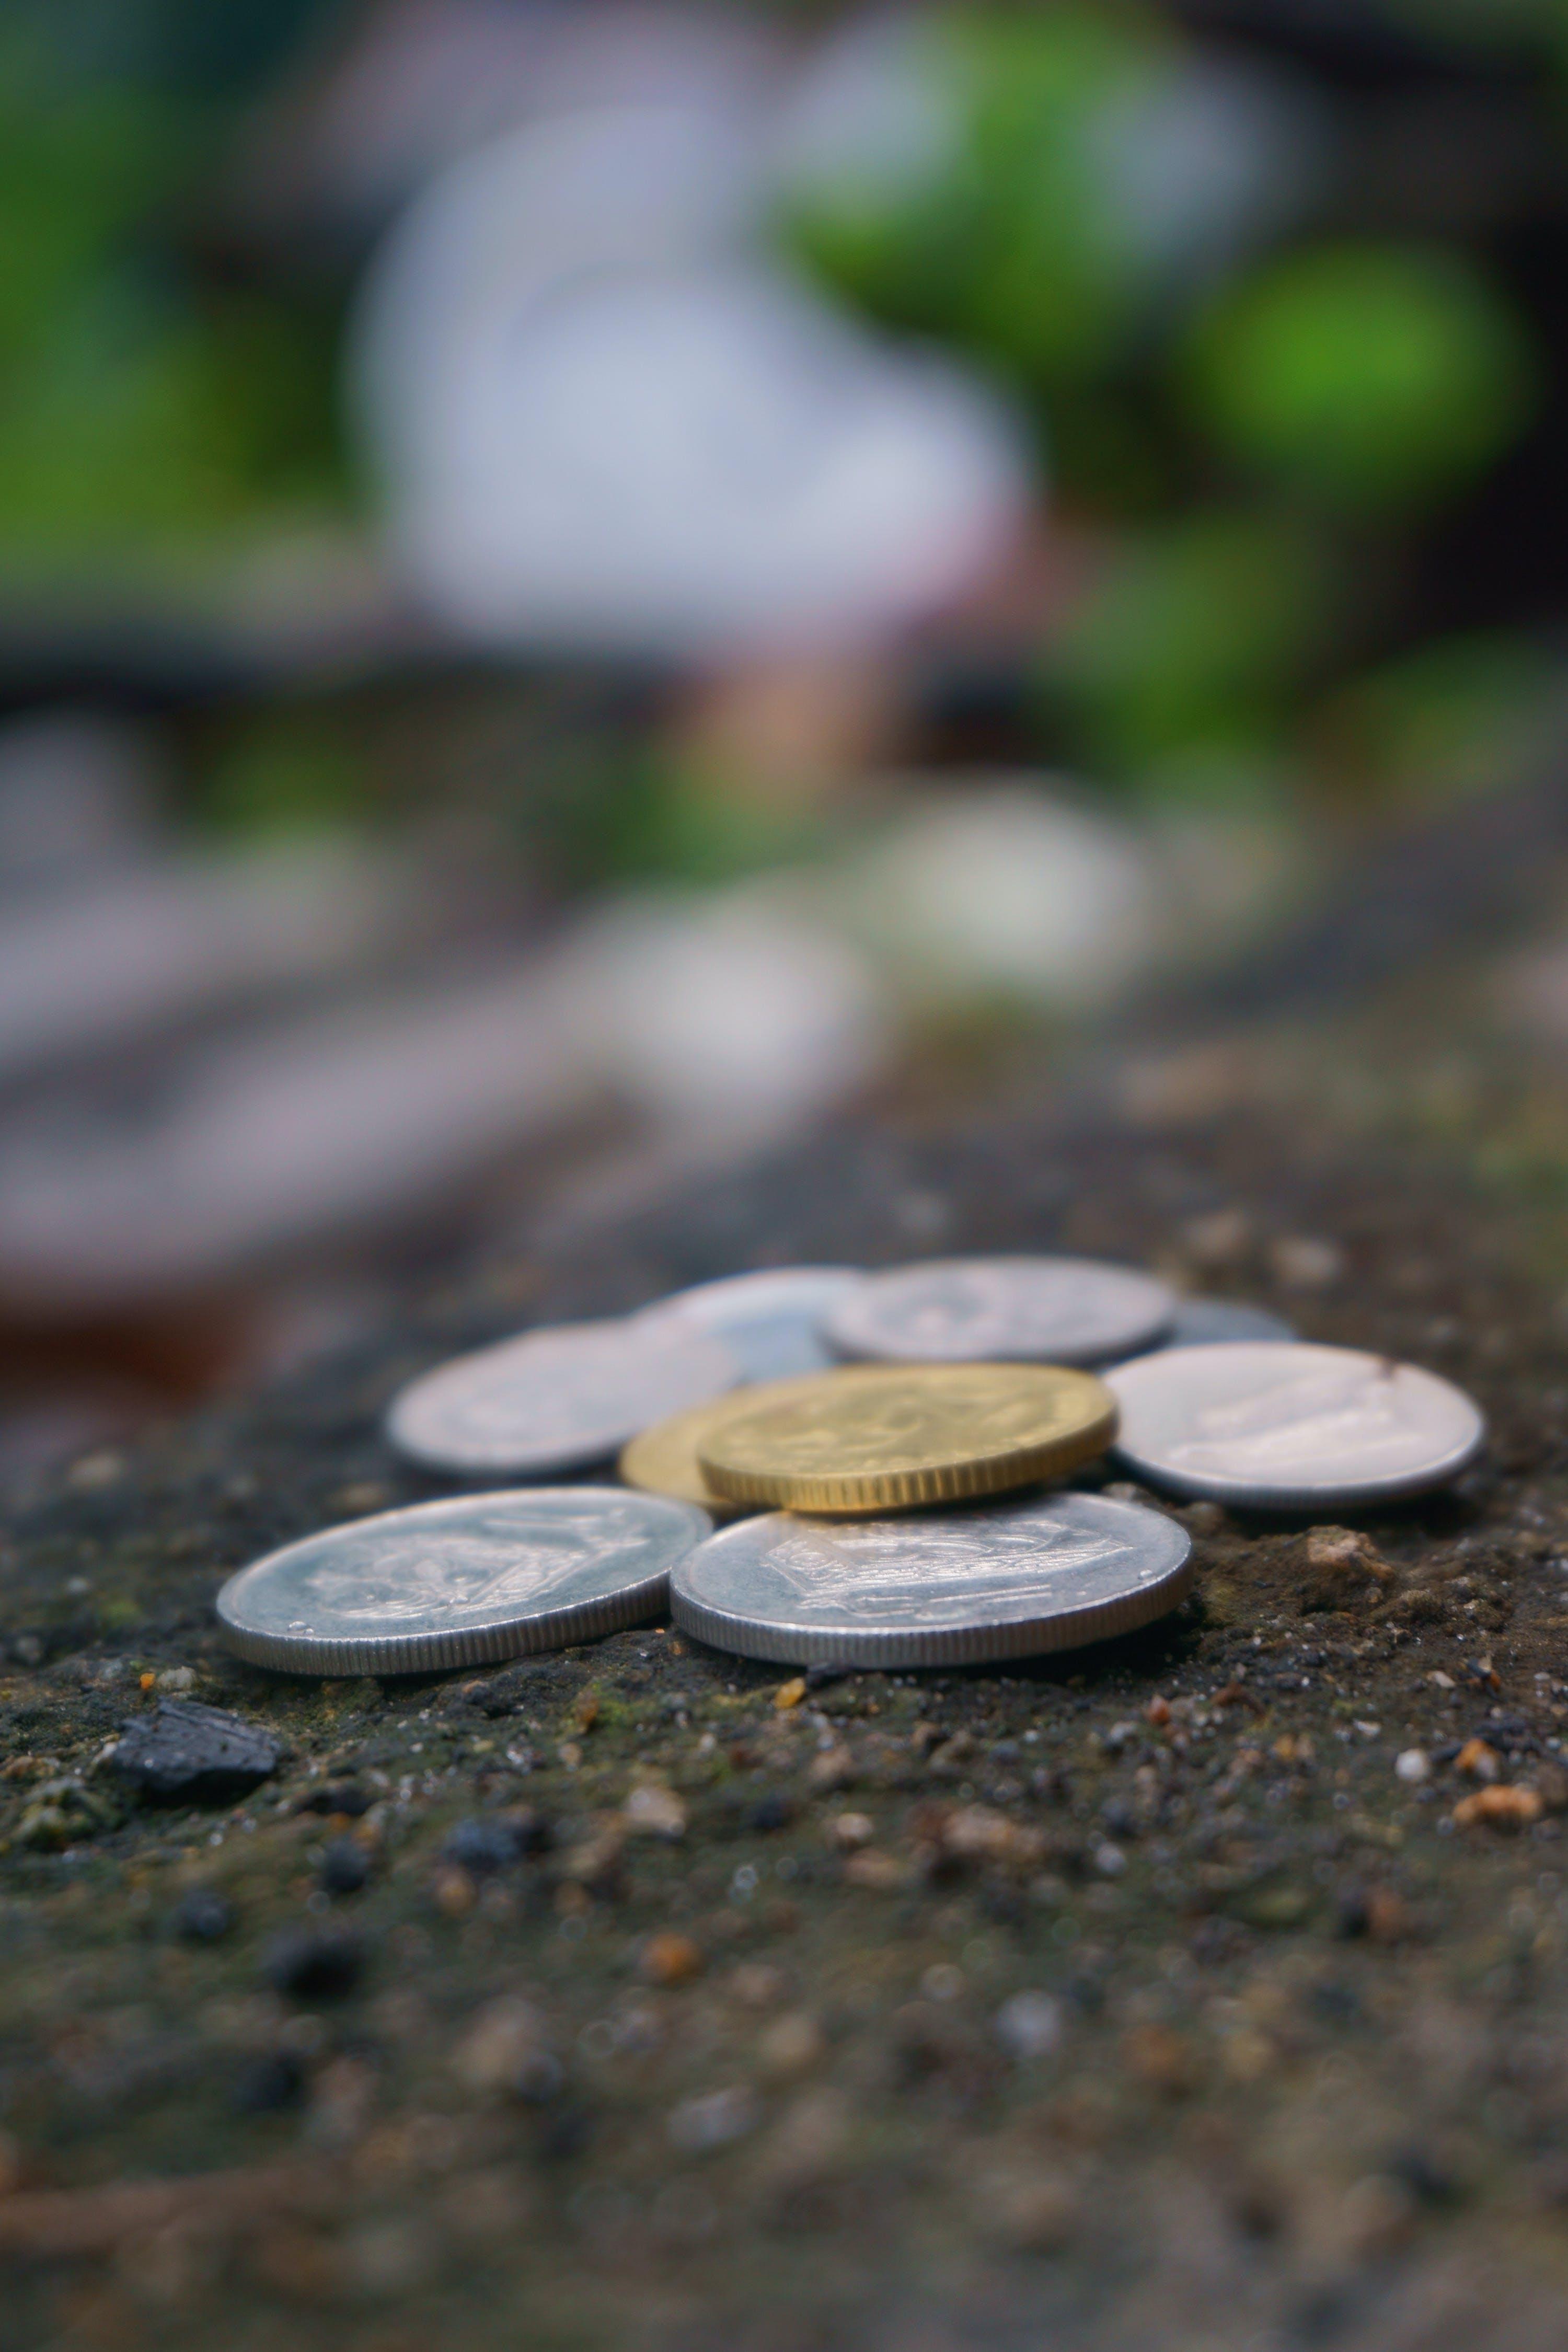 Free stock photo of nature, blur, ground, stones